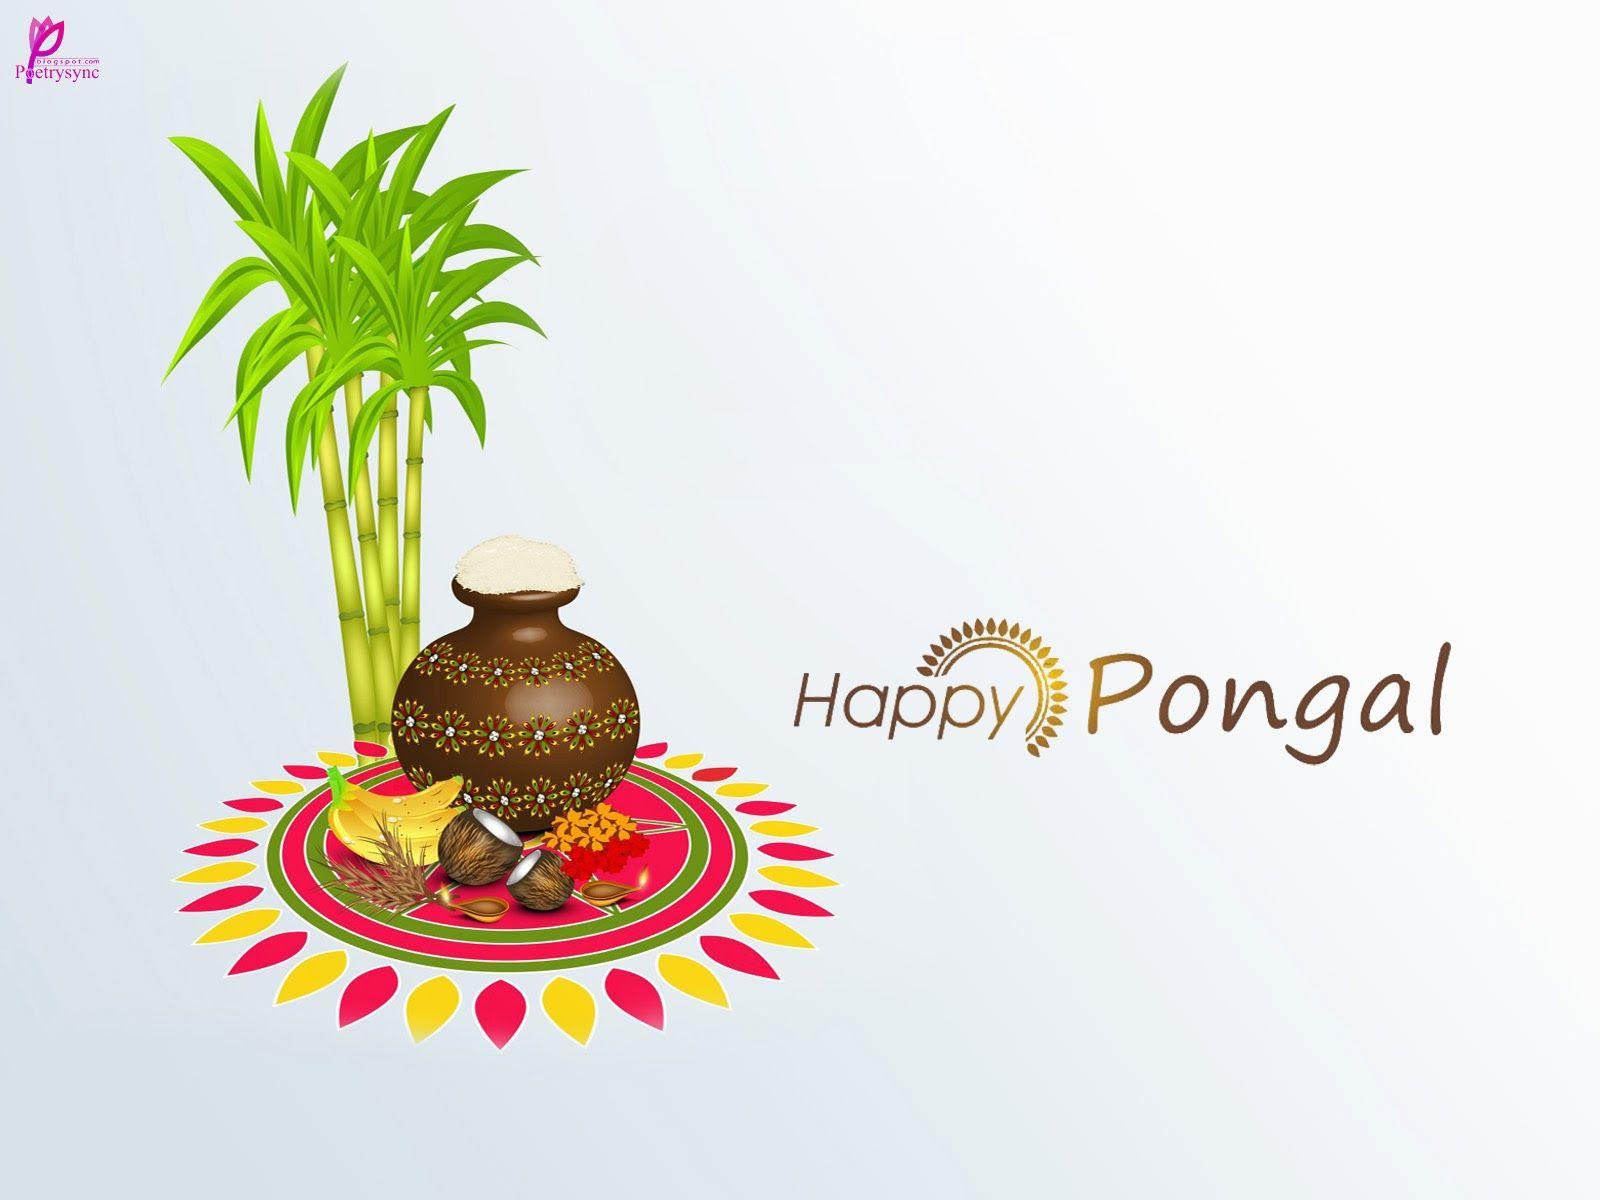 Happy Pongal Wishes Image.